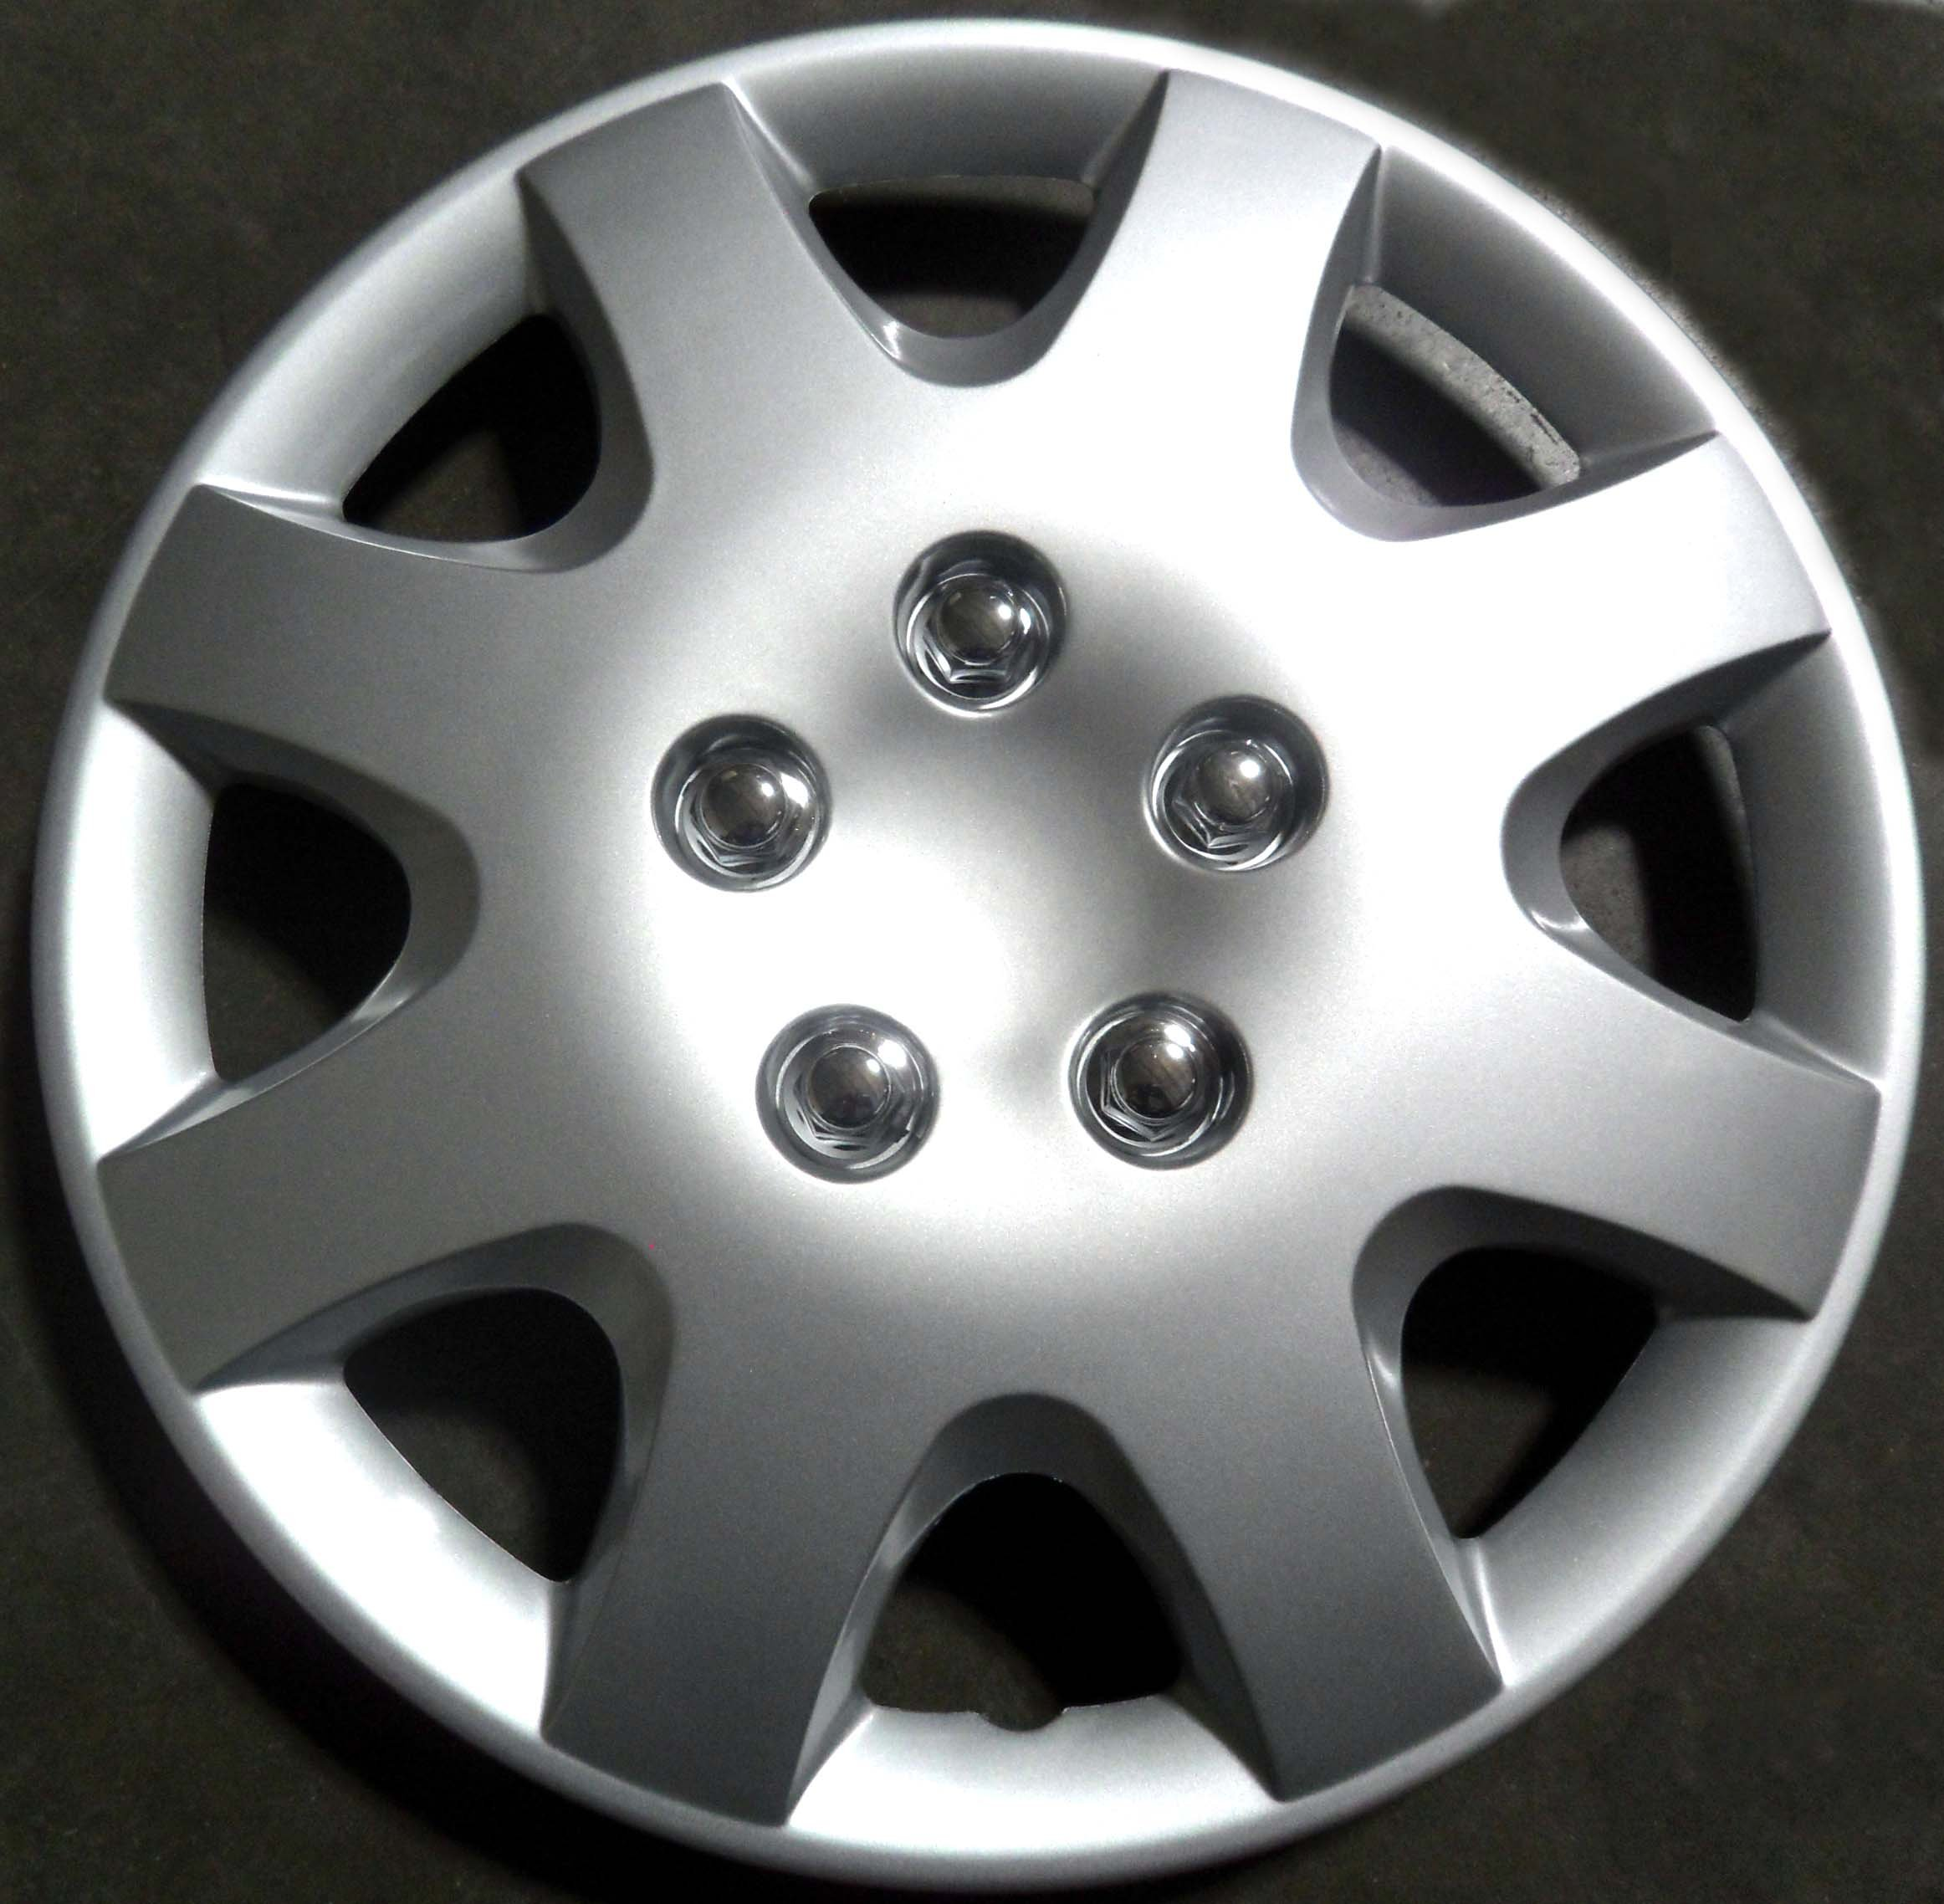 AutoSmart Drive Accessories KT-895-15S/L, Honda Civic, 15'' Silver Replica Wheel Cover, (Set of 4)